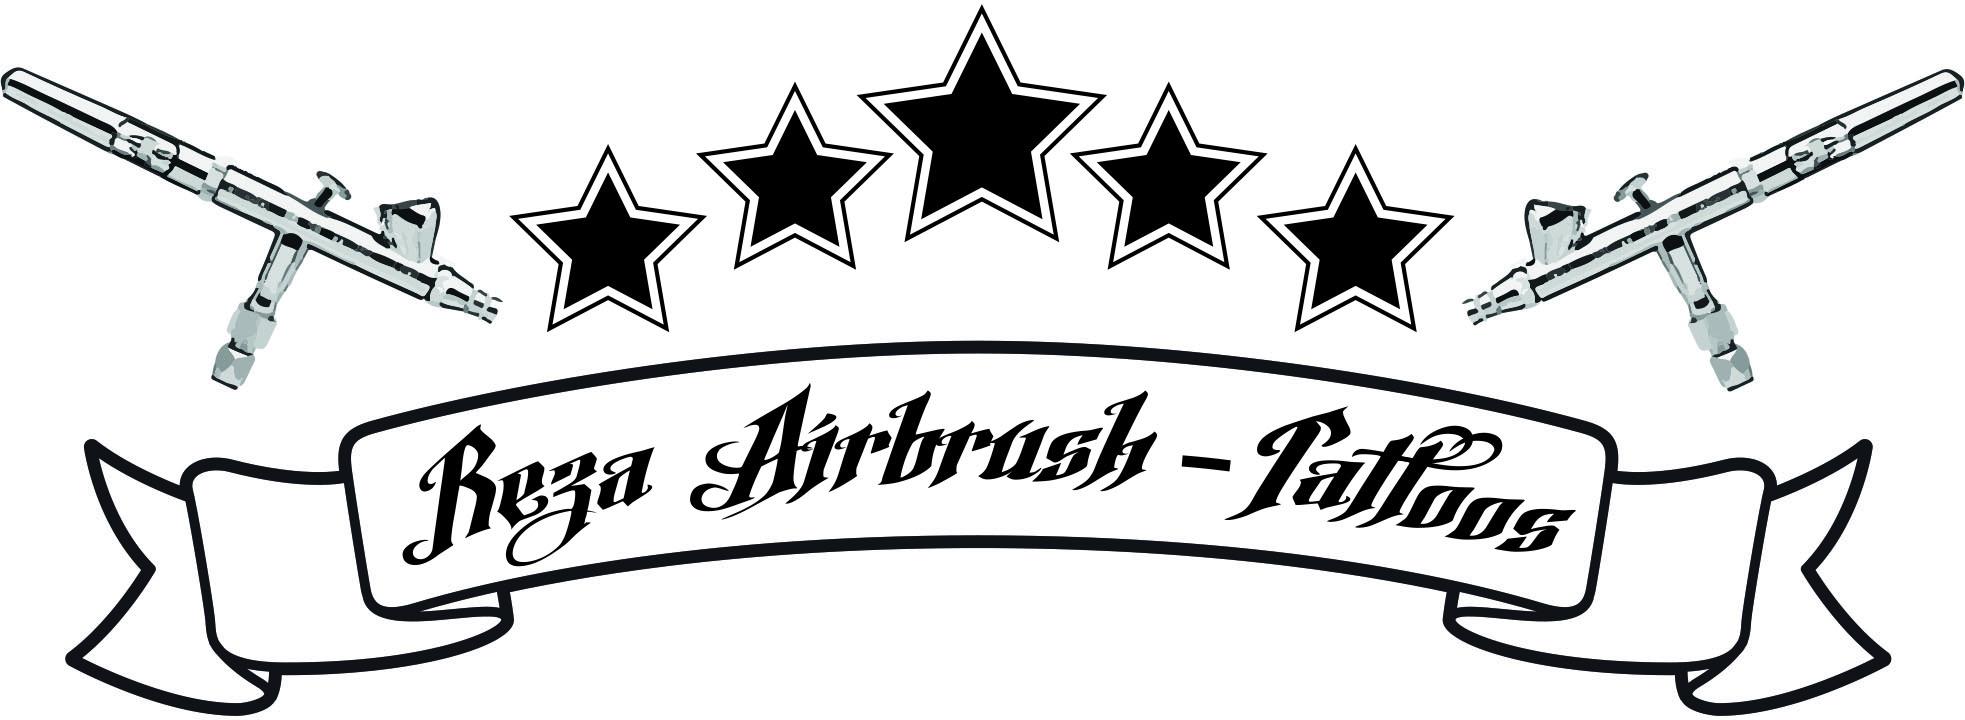 Rezas mobiles Airbrush Tattoo – Reza-Tattoos.de